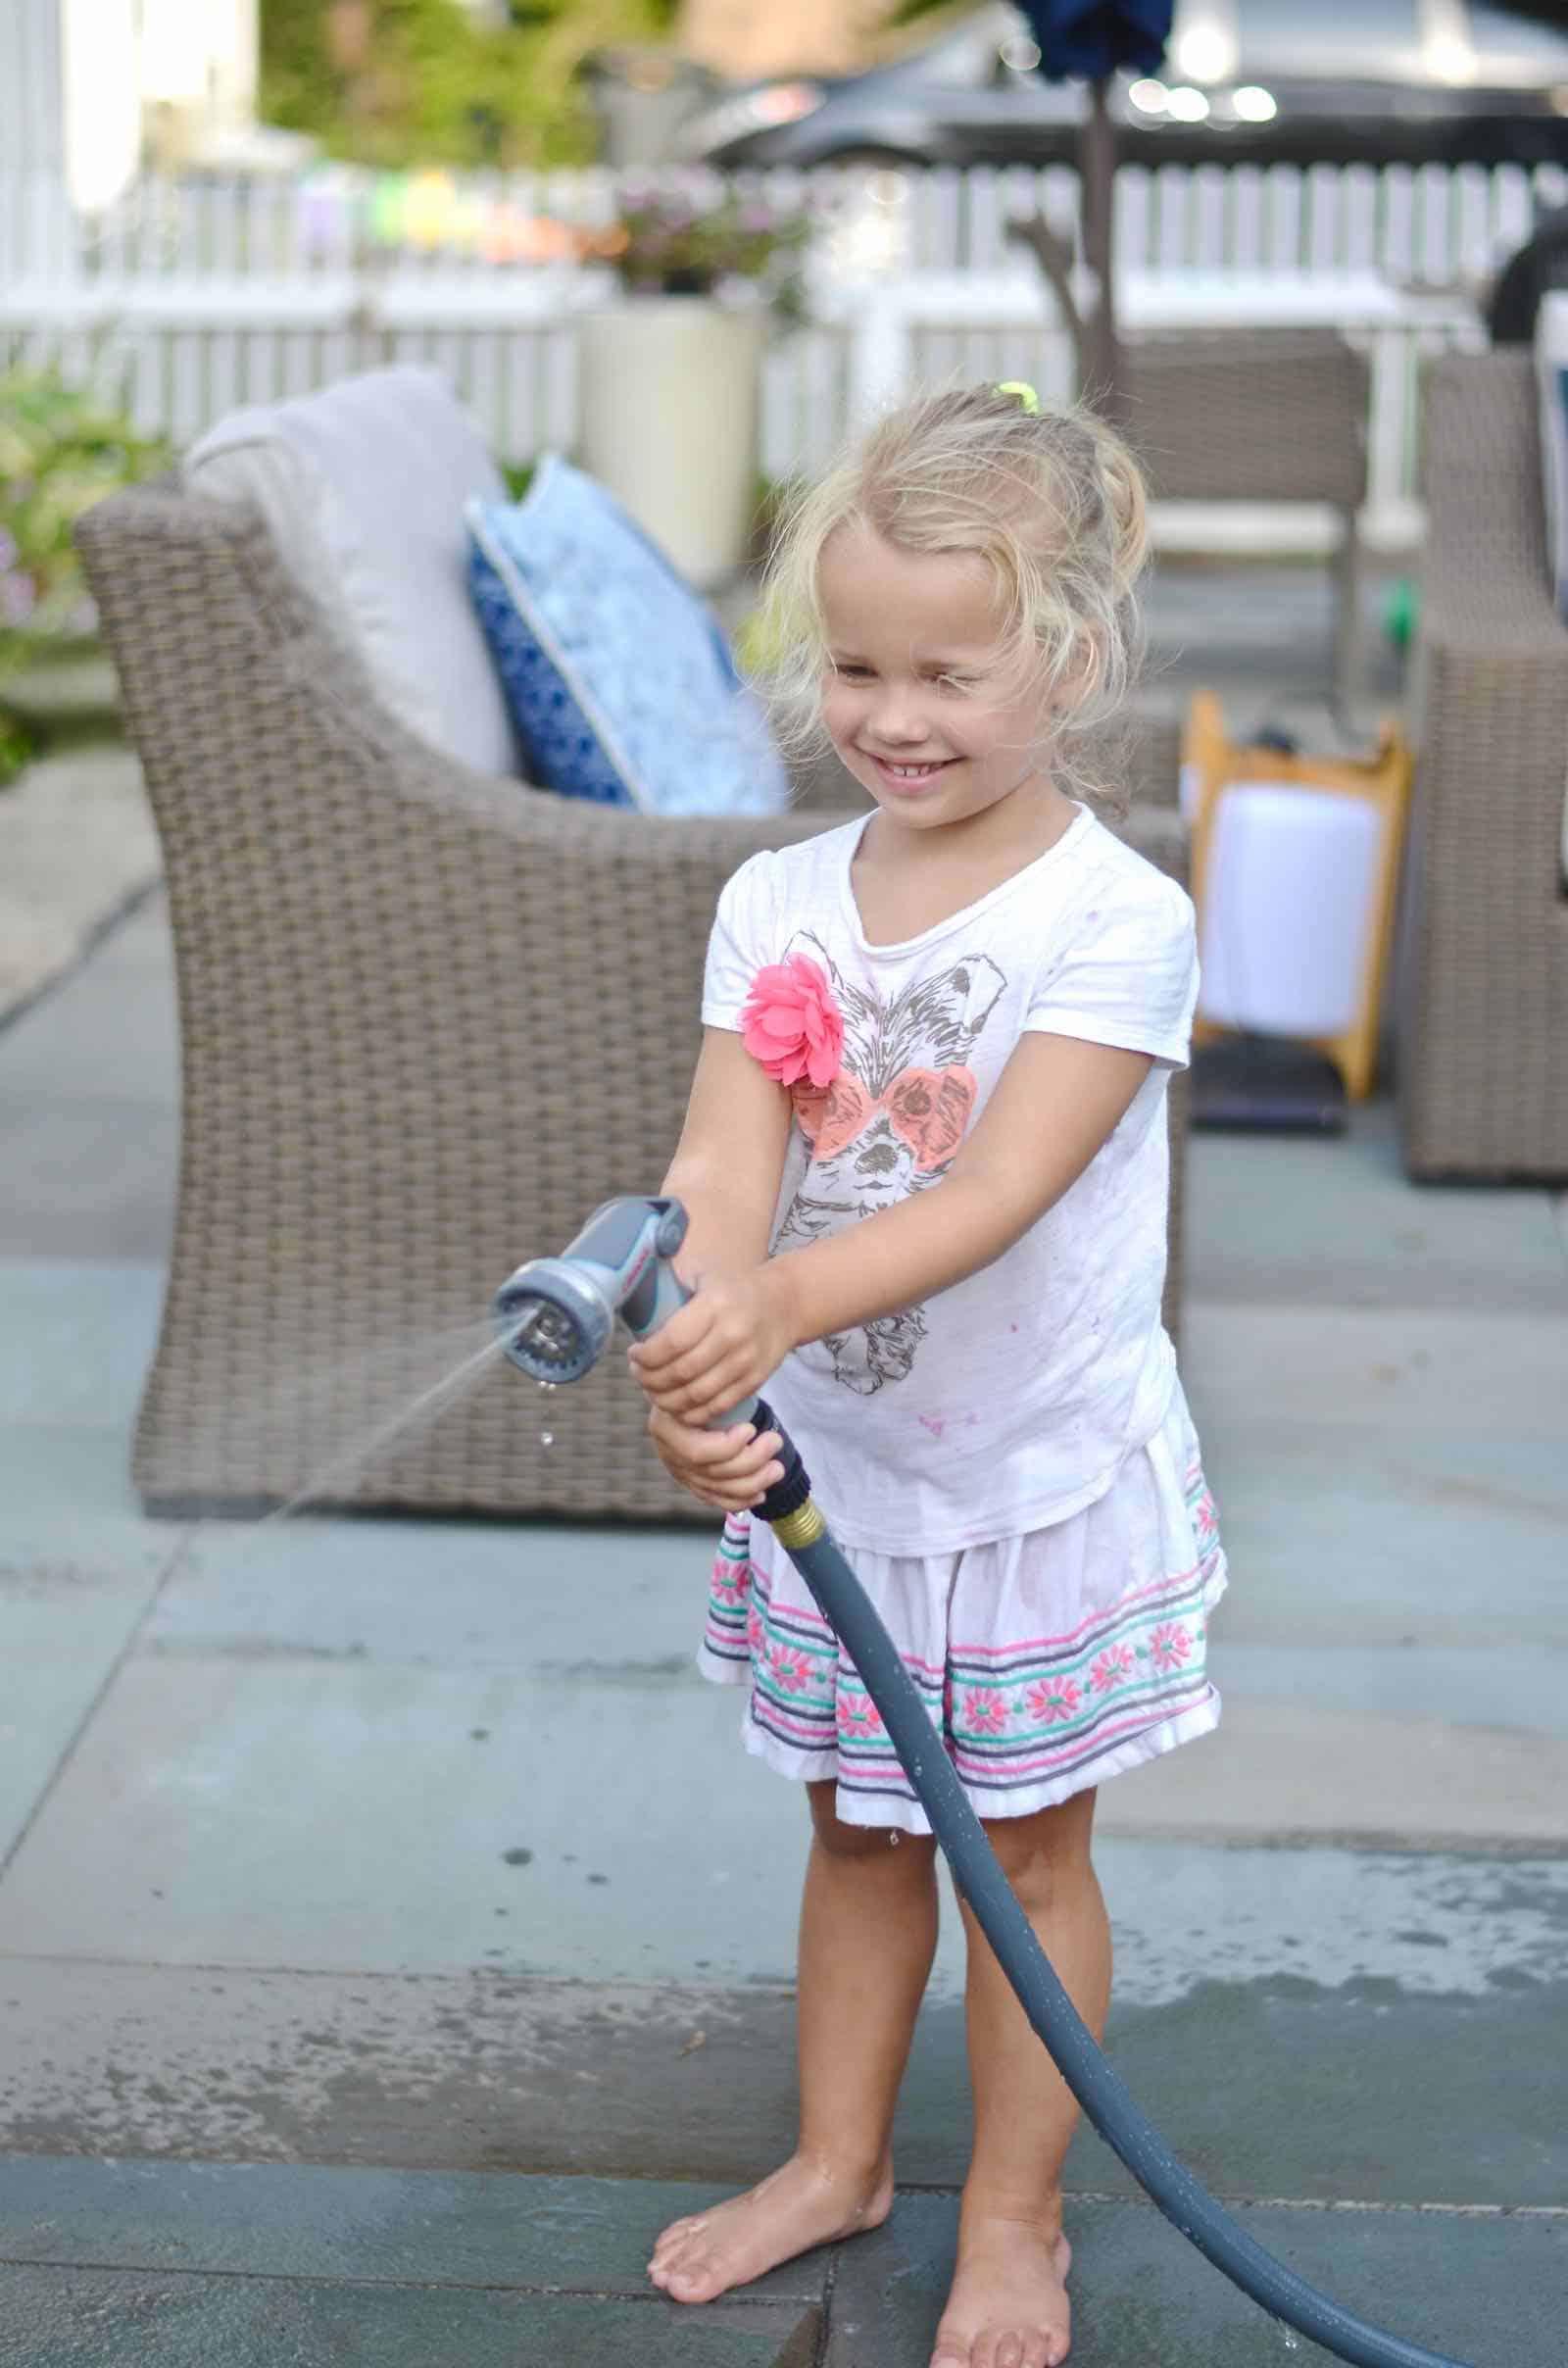 watering the backyard